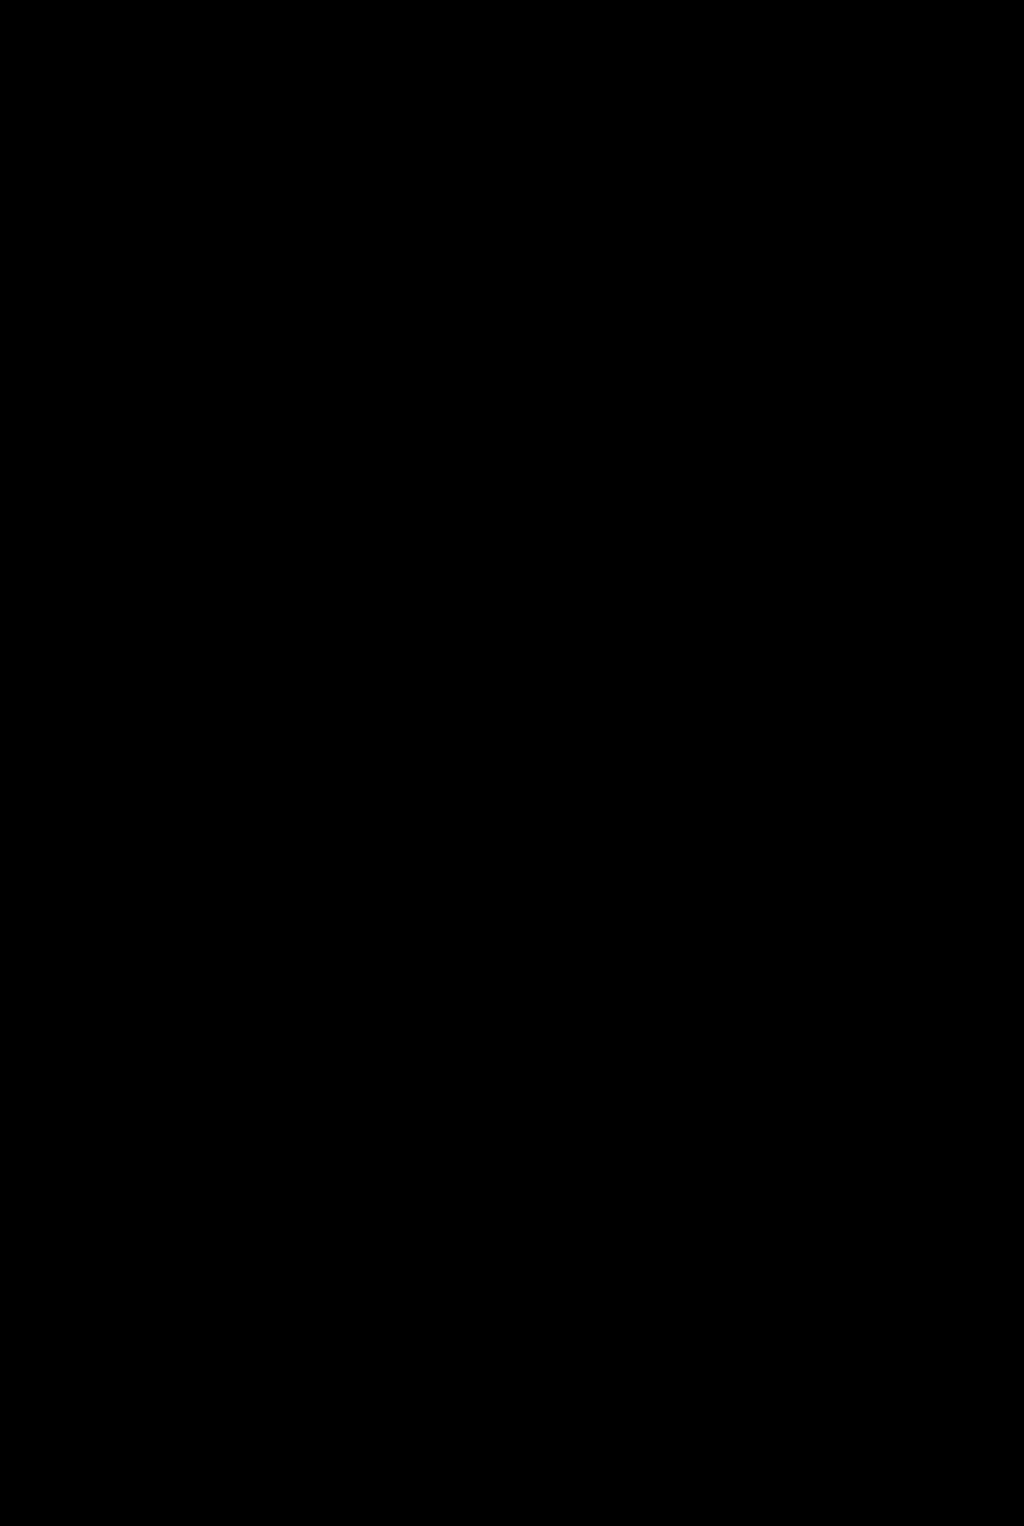 Evanna Lynch est connue pour son rôle farfelu de Luna Lovegood dans la saga Harry Potter